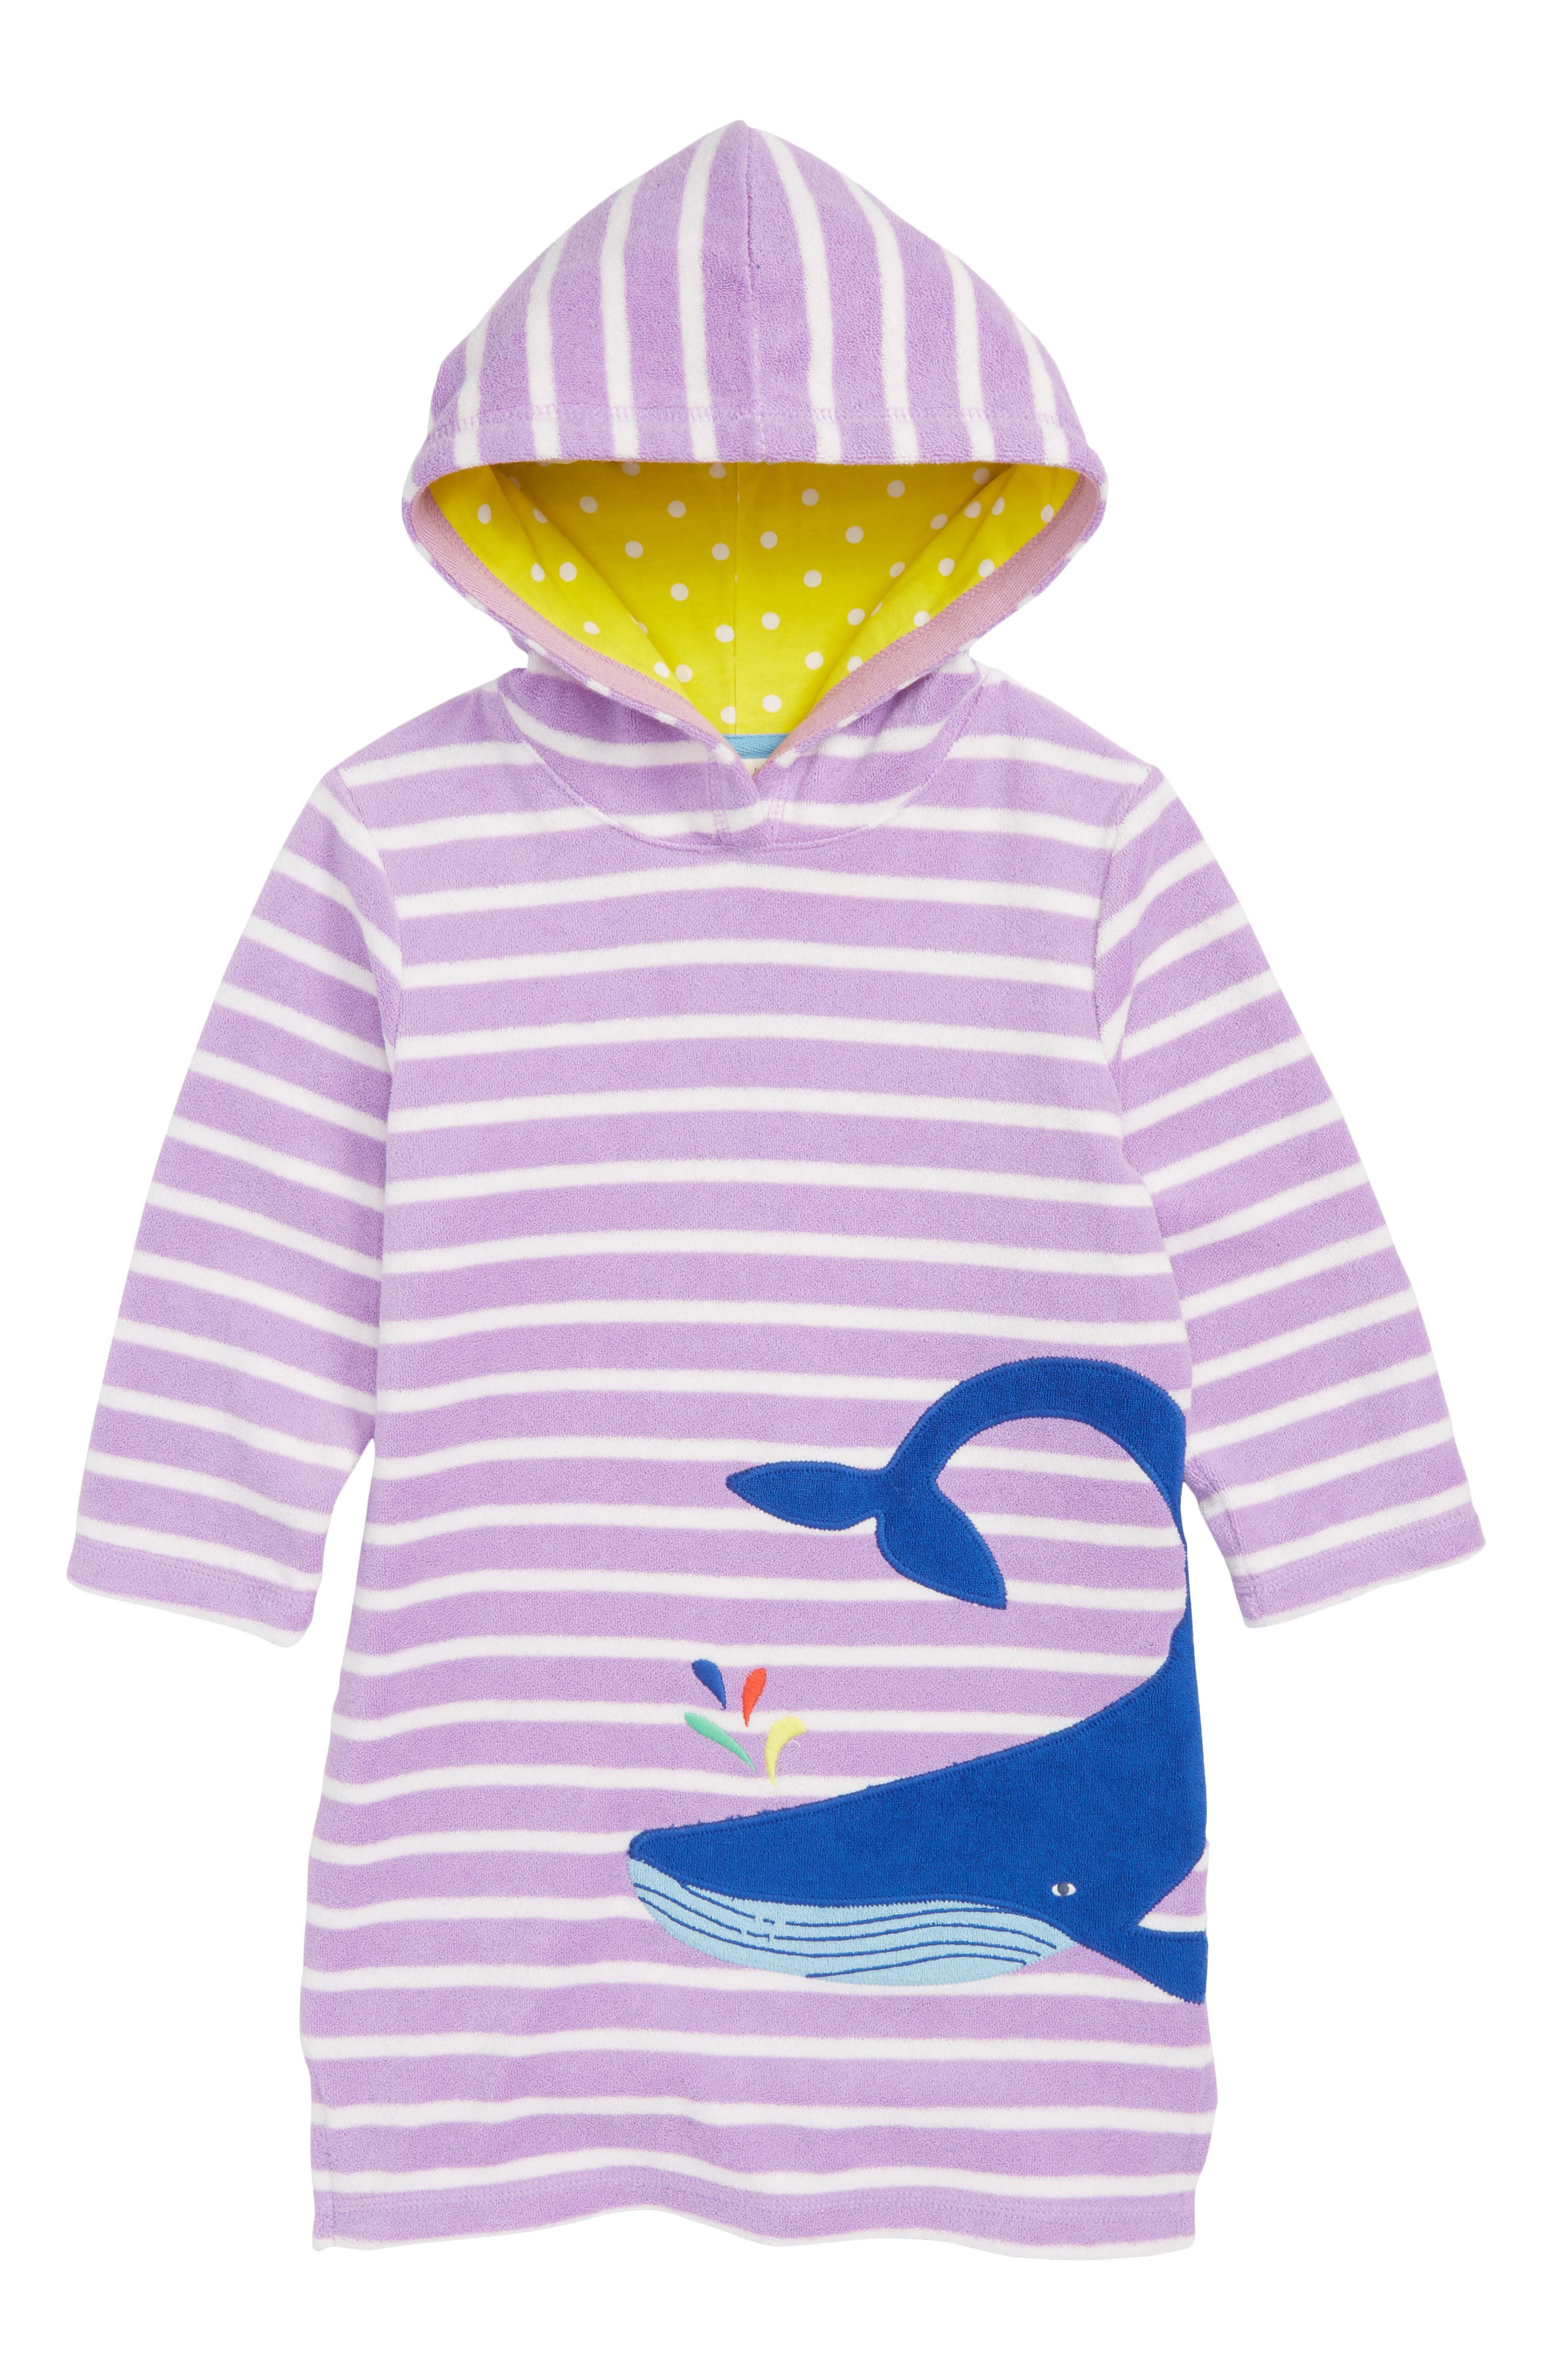 Appliqué Hooded Toweling Beach Dress,                             Main thumbnail 1, color,                             514